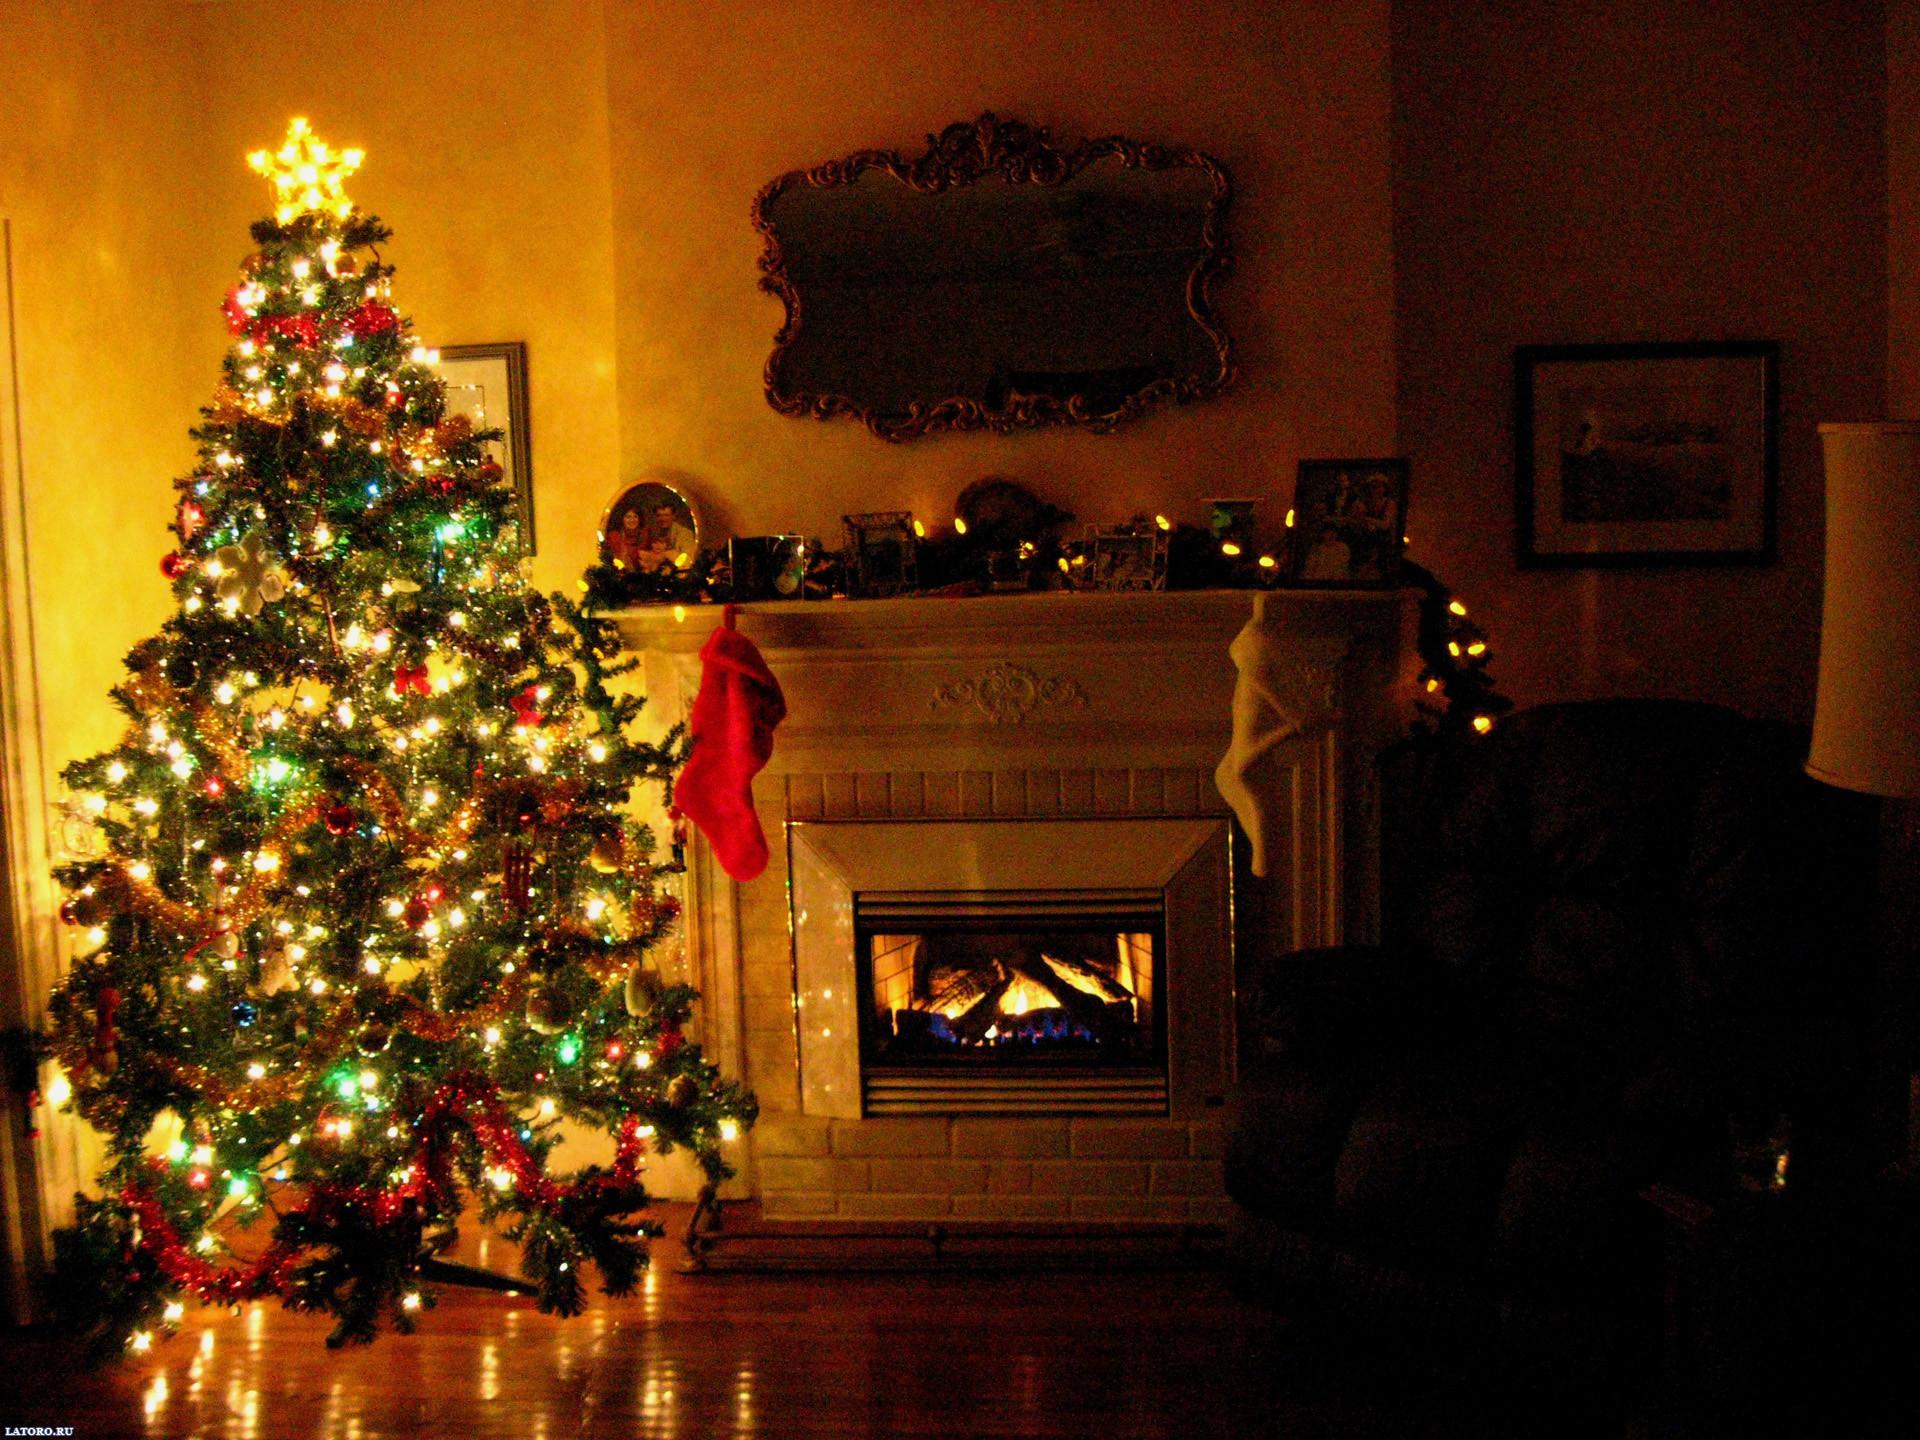 55 christmas desktop theme 55 christmas desktop theme